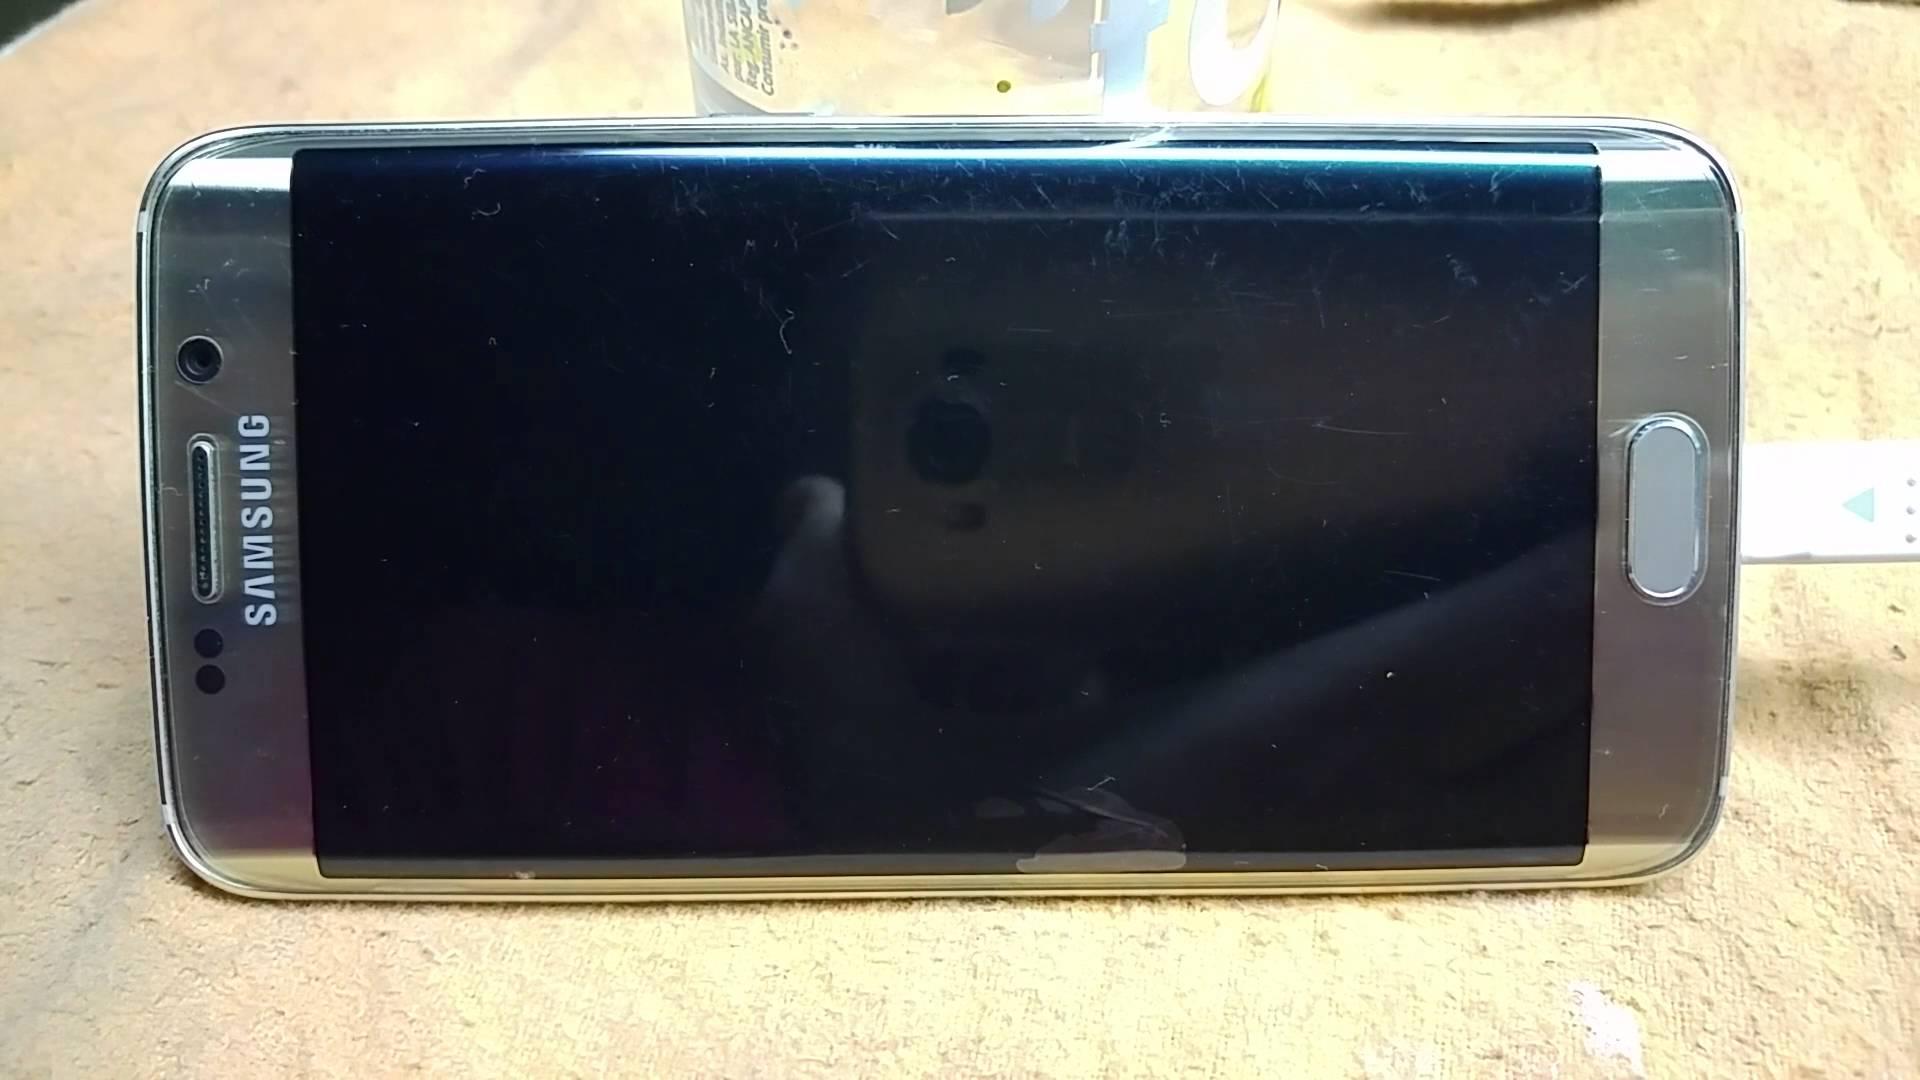 Samsung Galaxy S6 muerte súbita